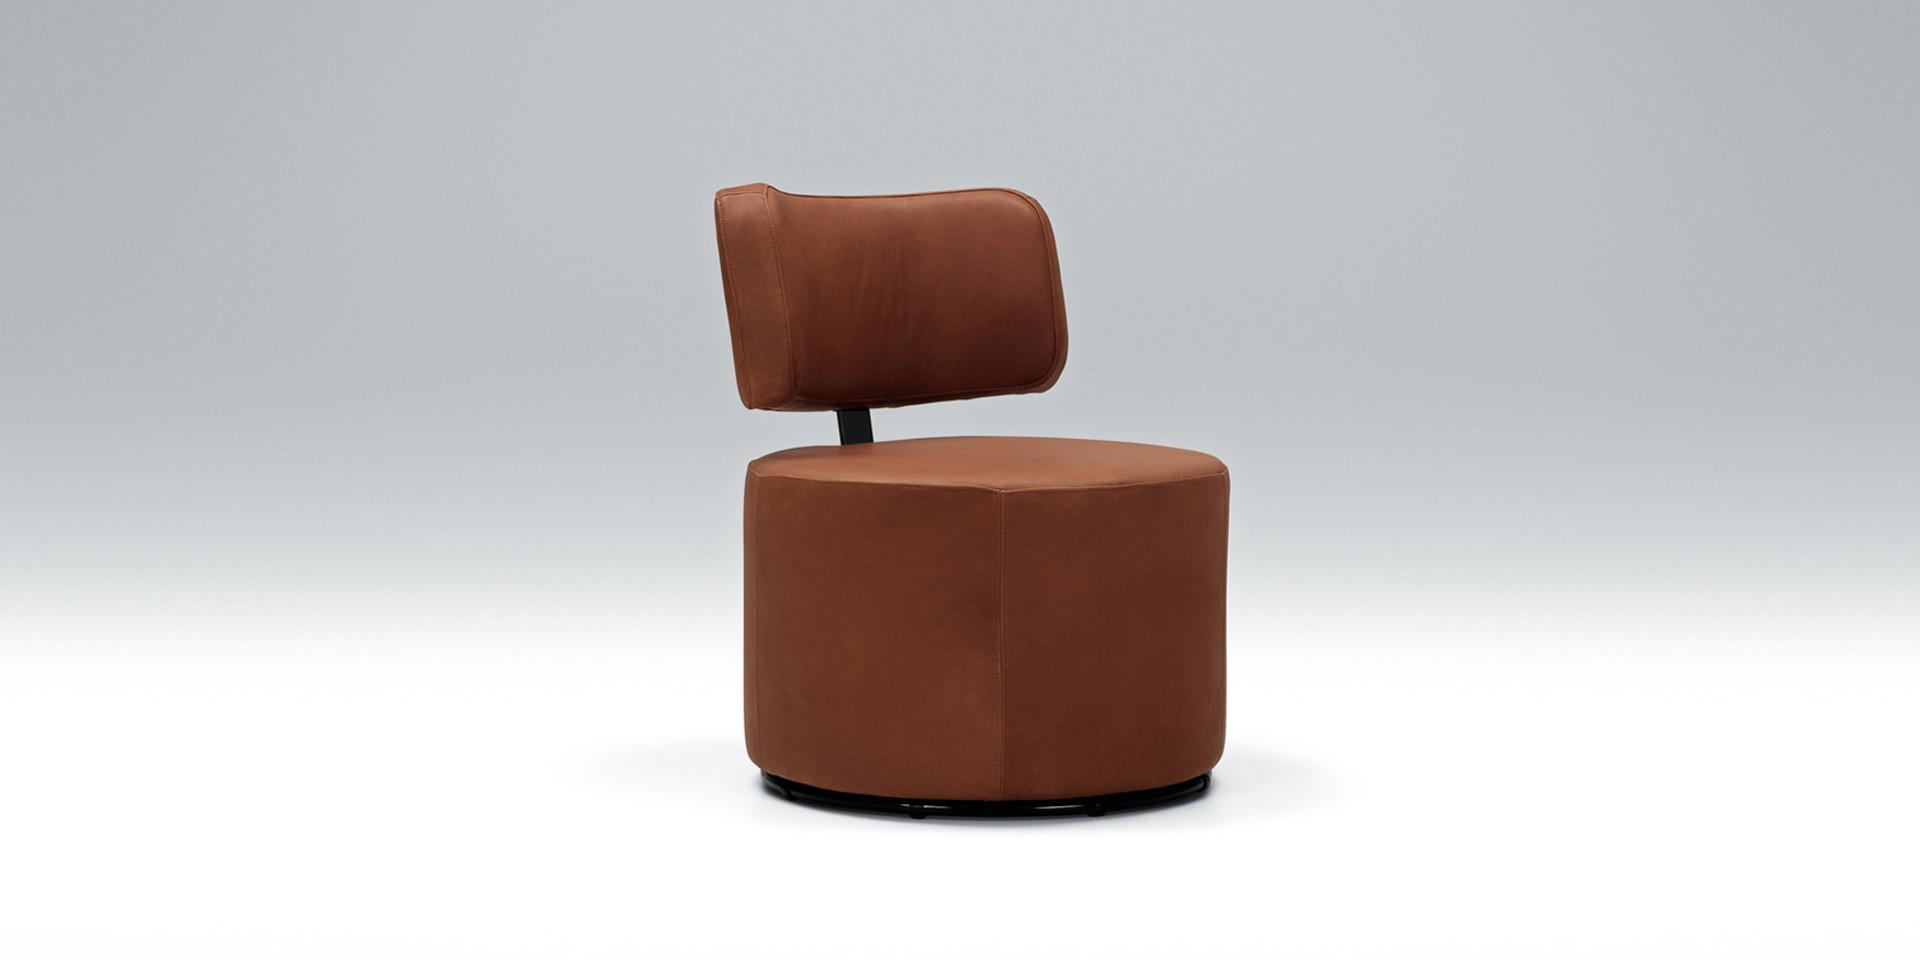 MOKKA_shadow_armchair_swivel_aniline2_cognac_2